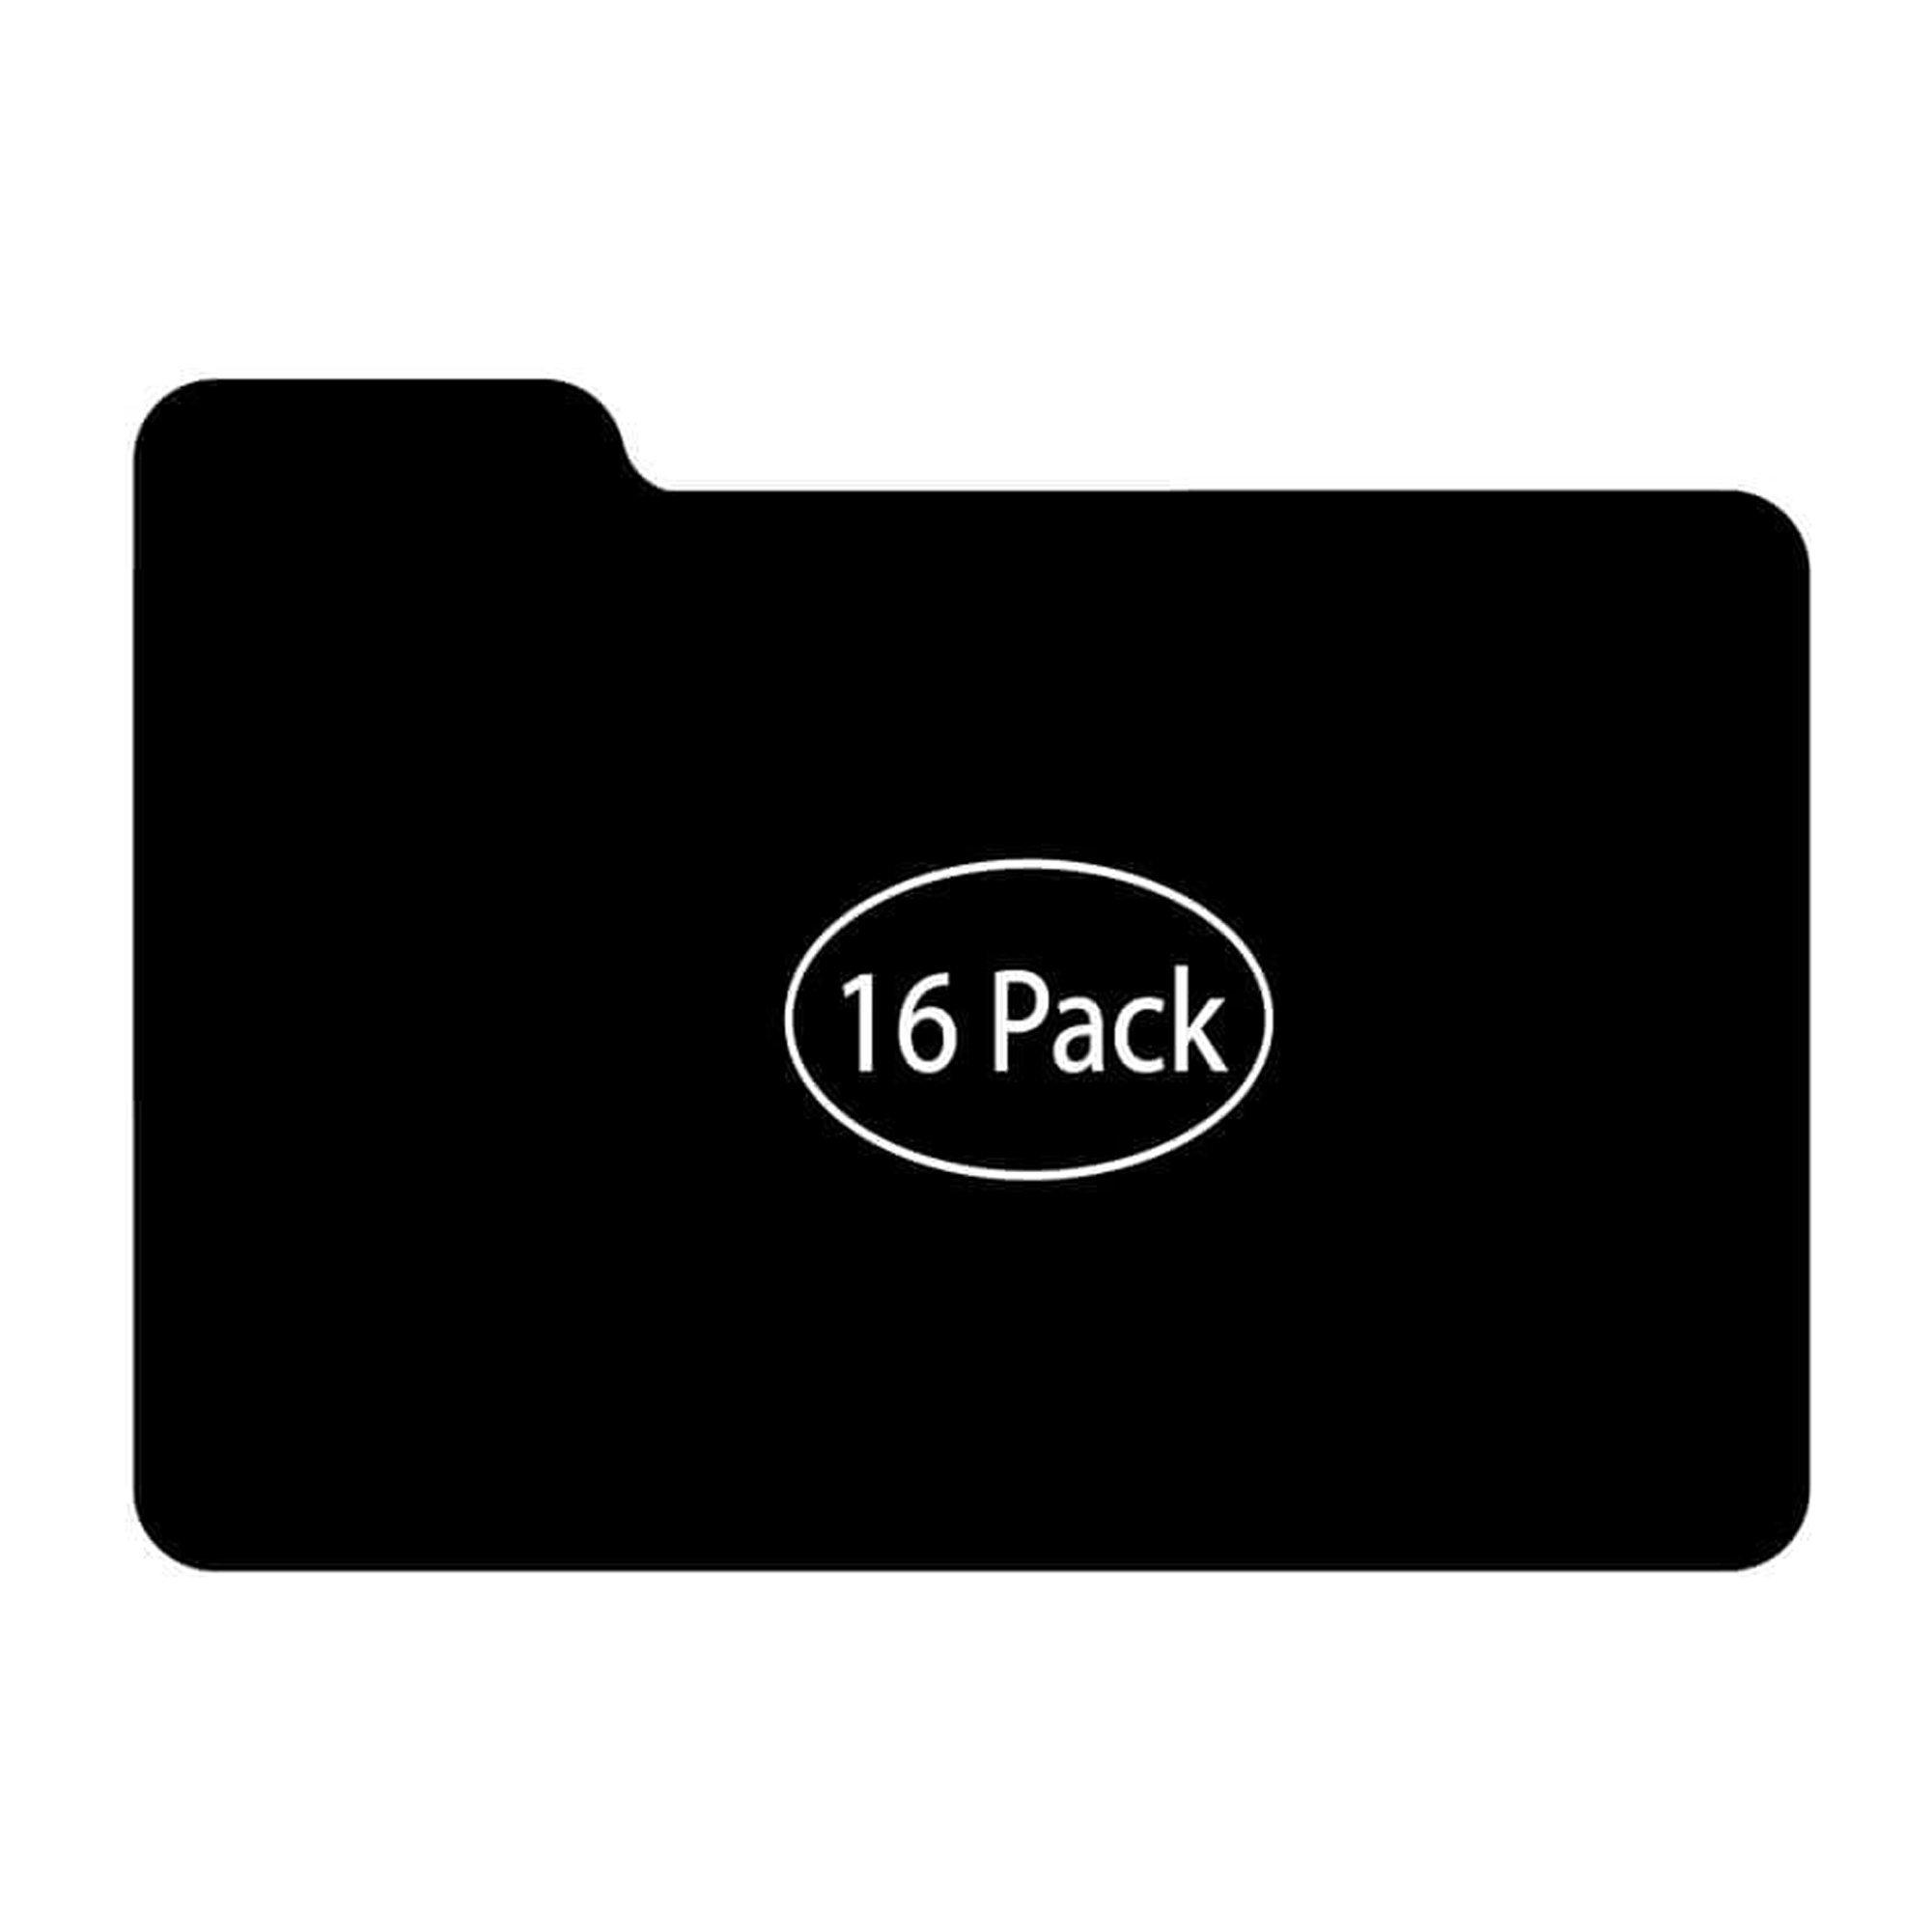 LONG & PRO Dividers 100 x 70mm | Pack 16pcs